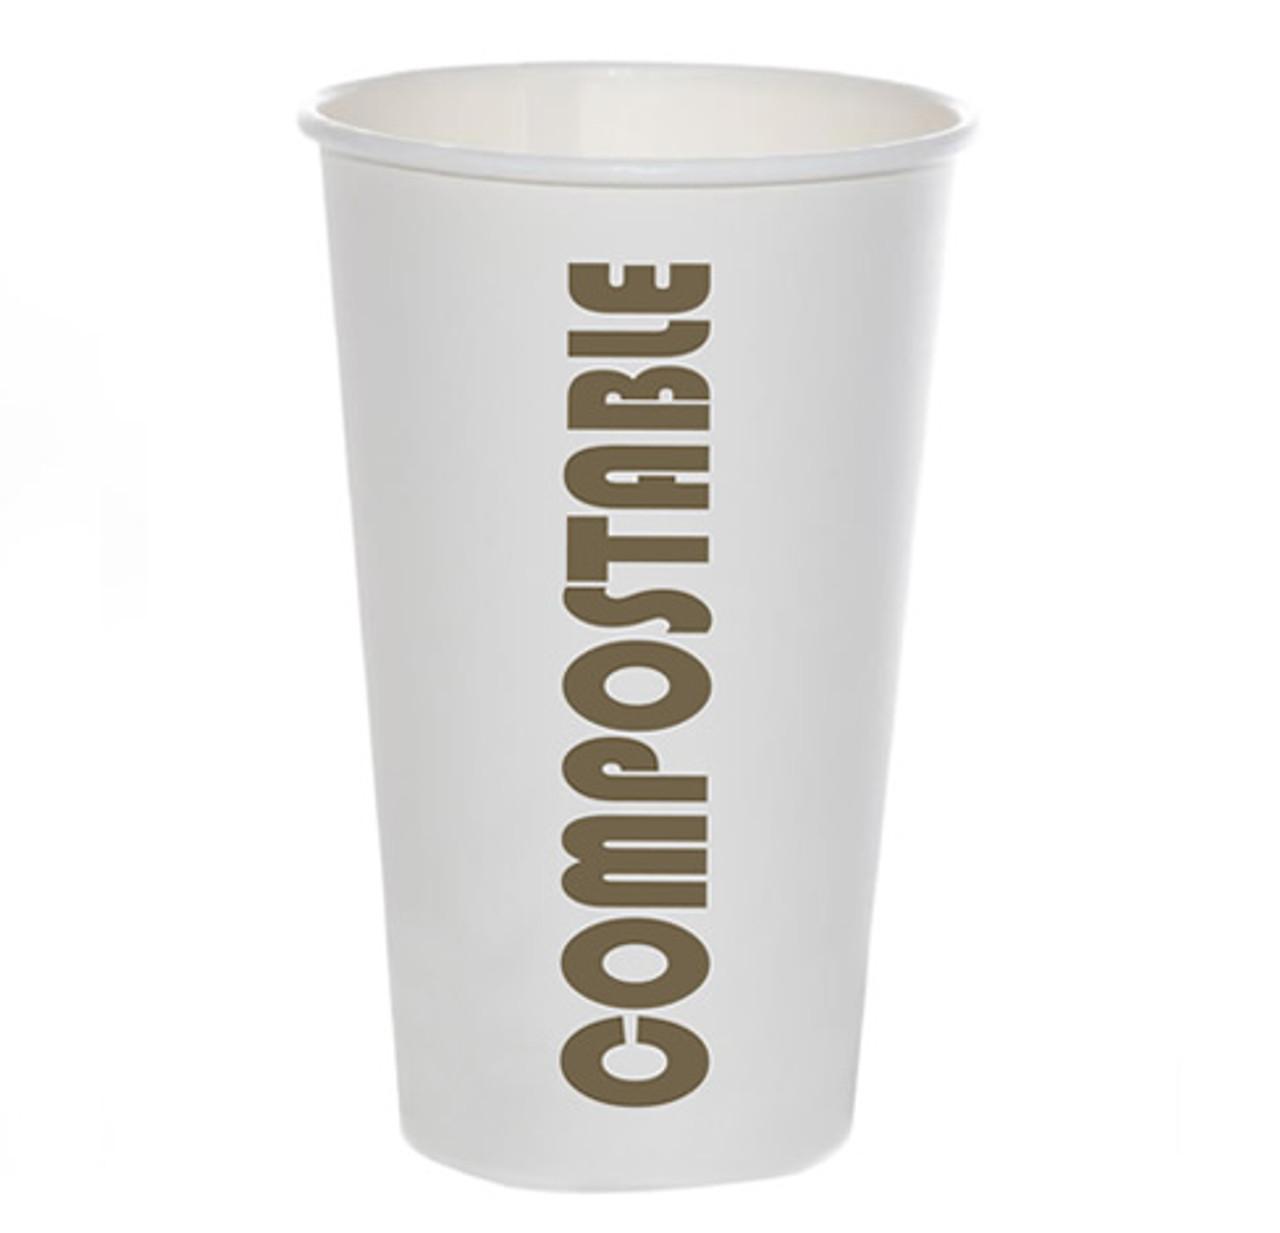 16oz Coffee Cup Compostable Print™ Series